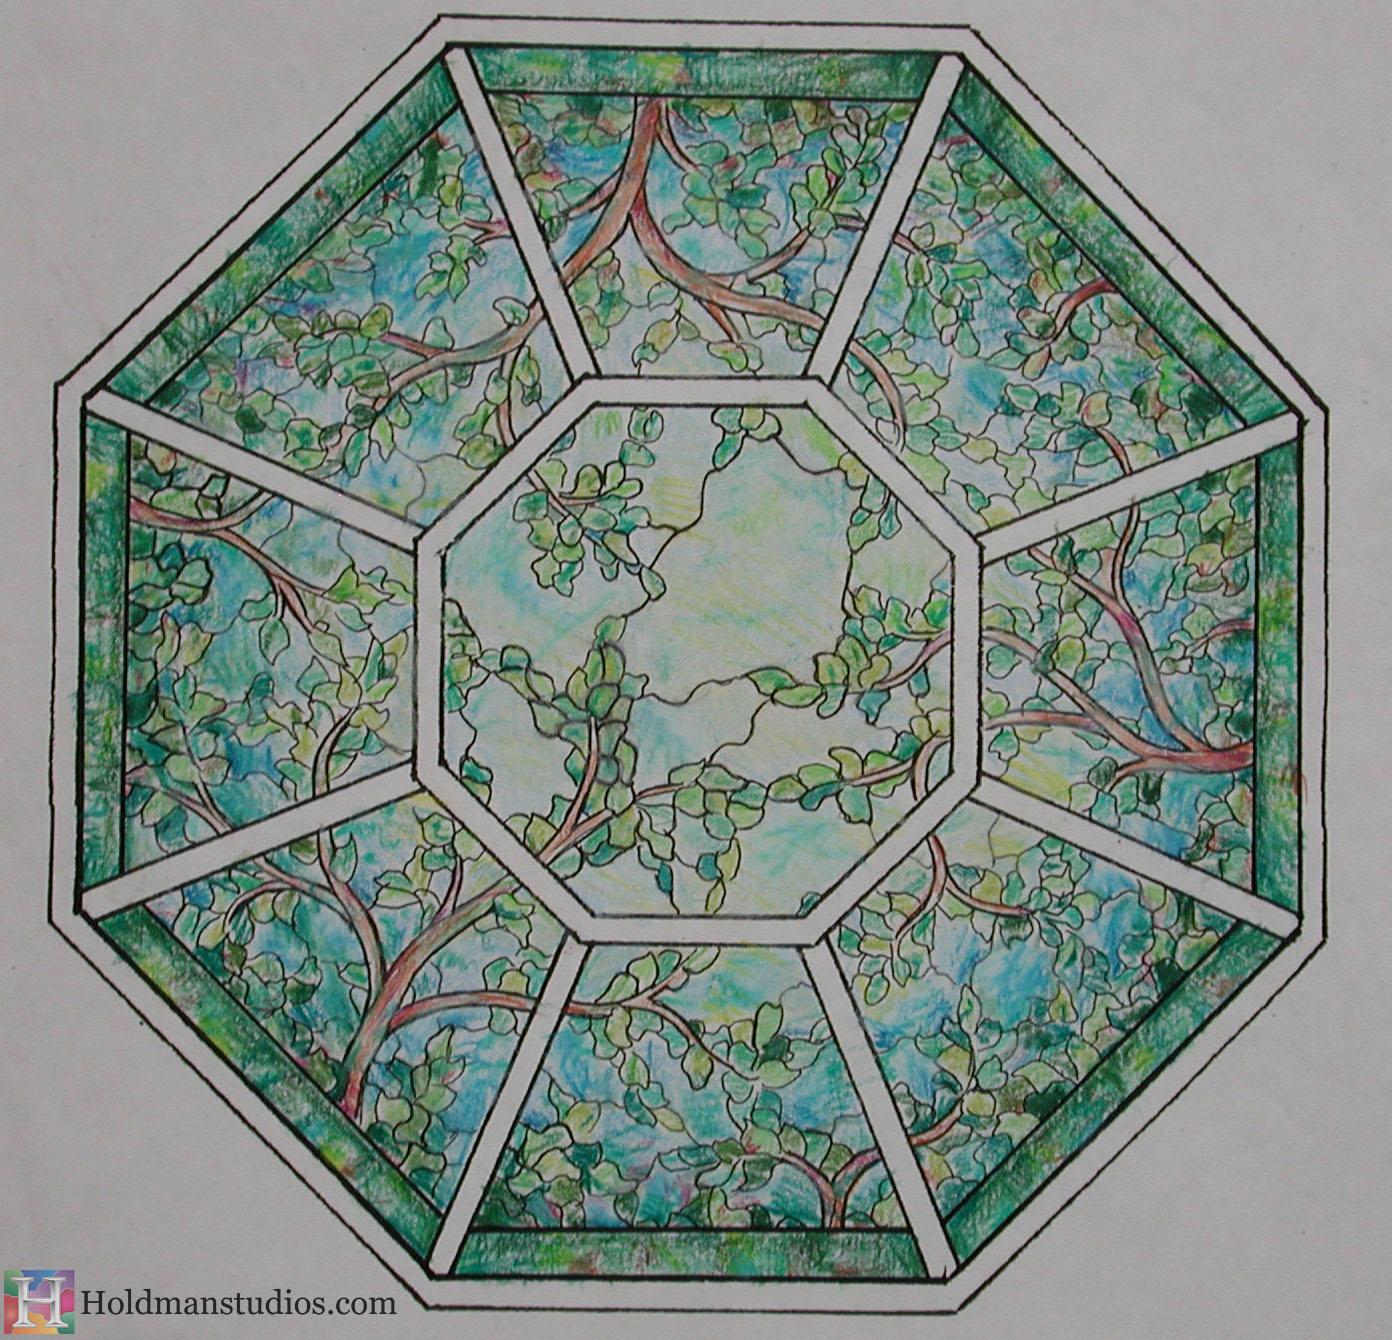 Holdman_Studios_Stained_Art_Glass_LDS_Mormon_Palmyra_New_York_Temple_Sacred_Grove_Tree_of_Life_Skylight_Artist_Sketch.JPG